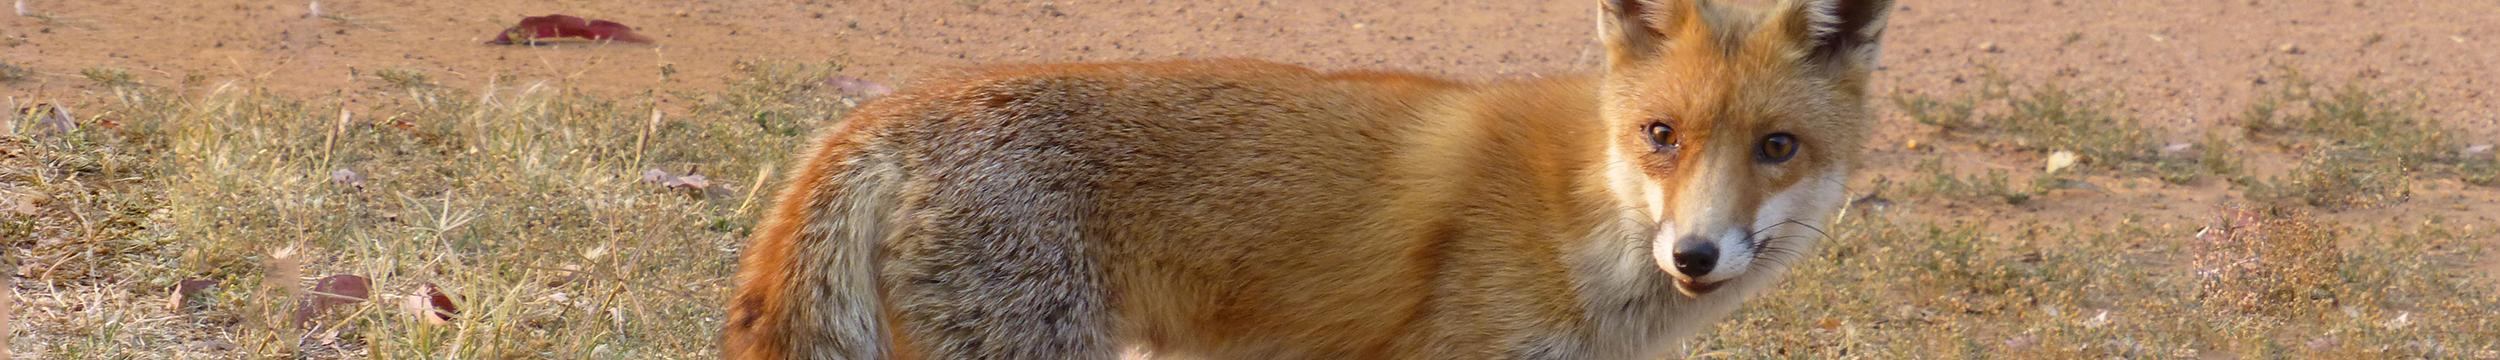 Header-Fox-JohnGreen